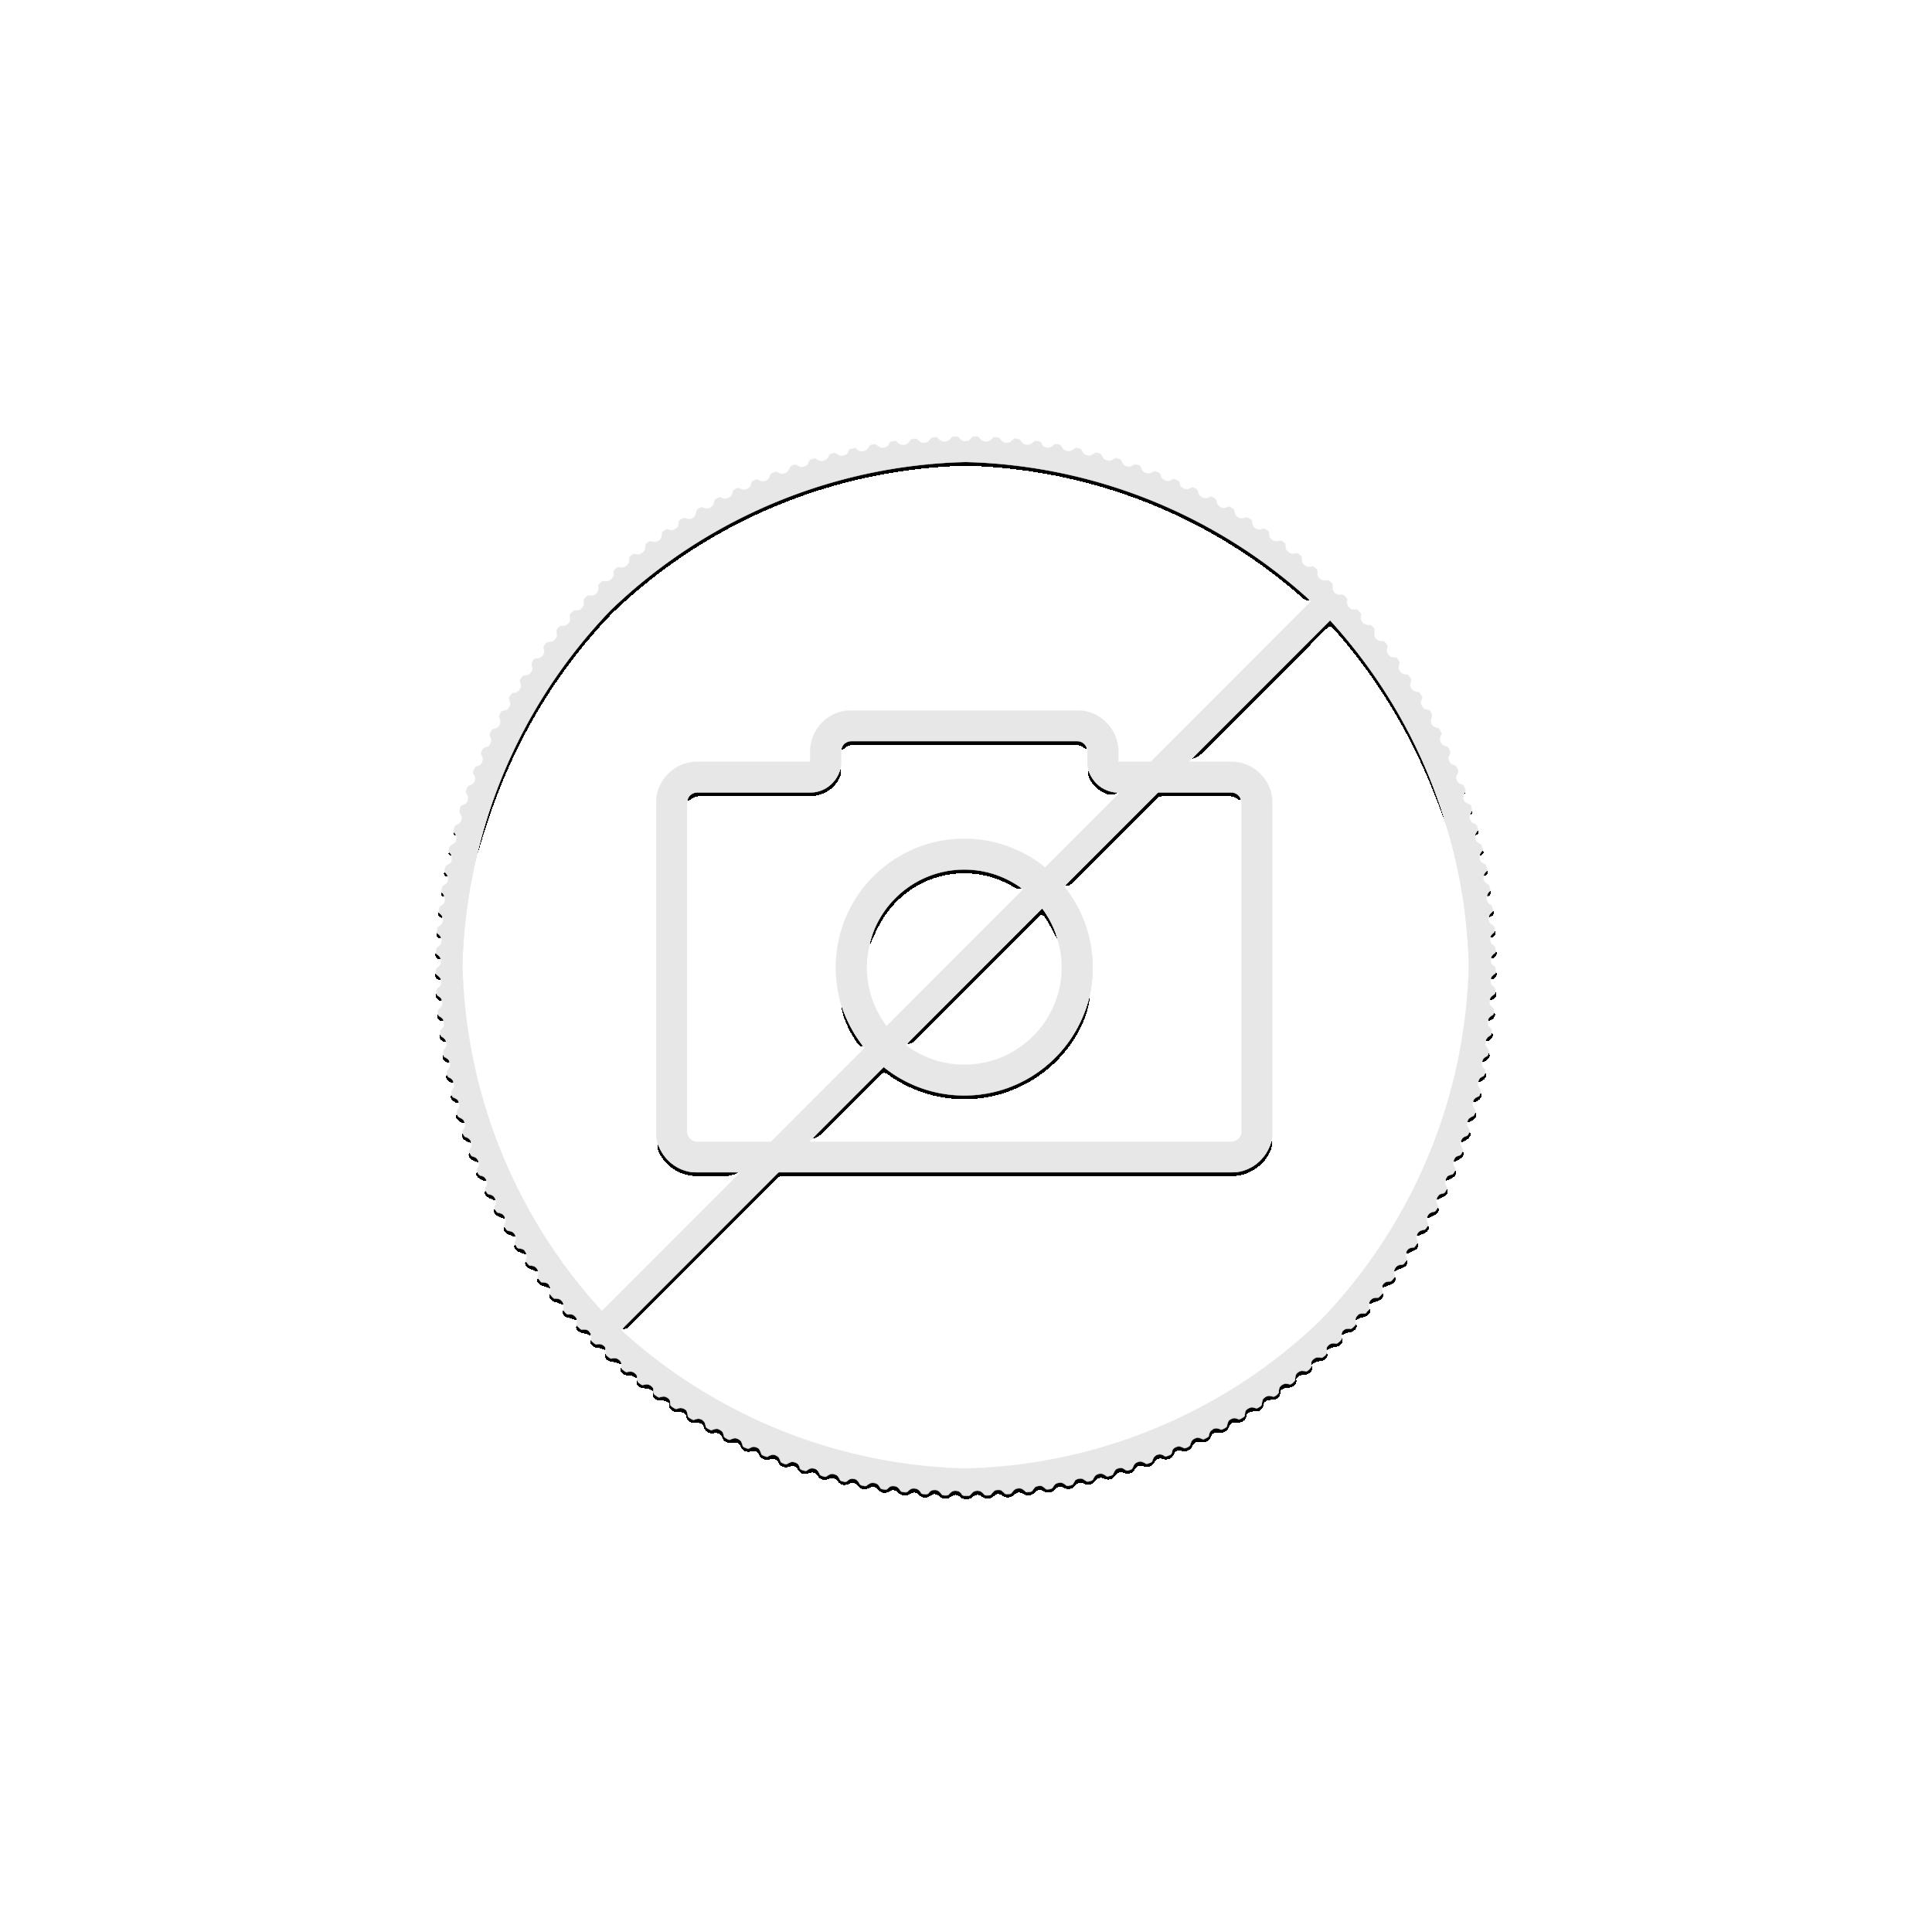 1 Troy ounce gouden munt Kangaroo 2020 achterzijde